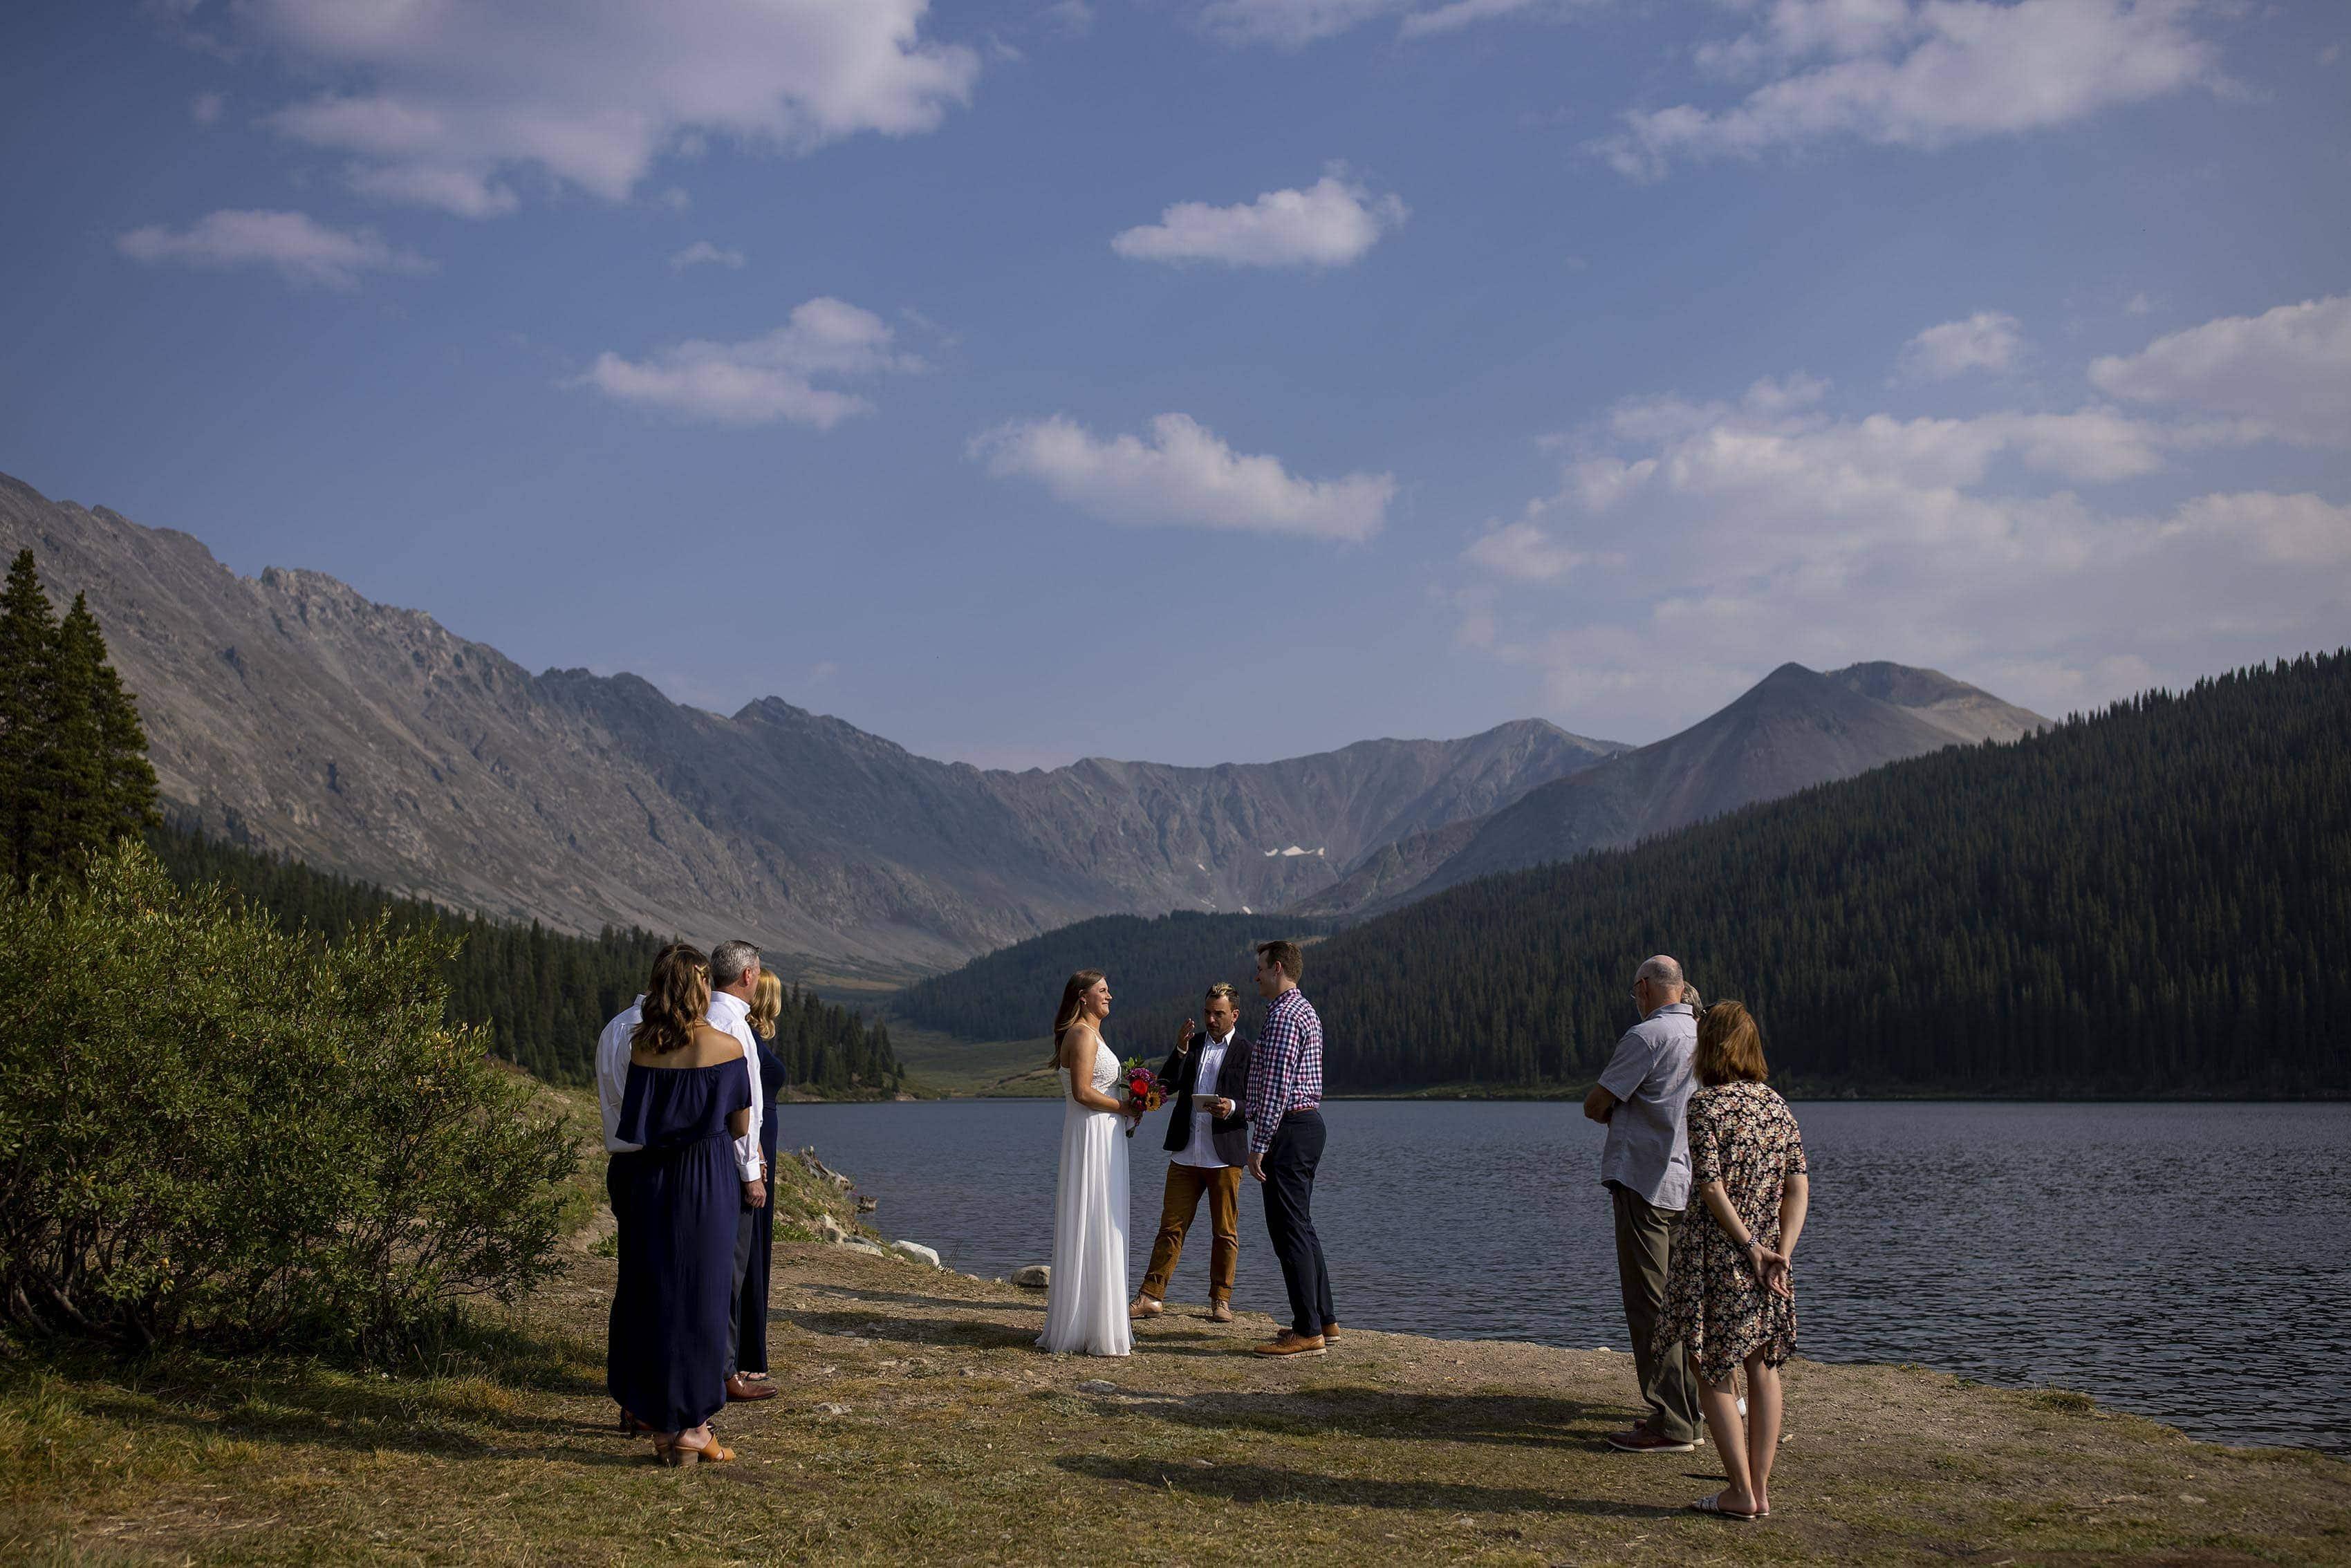 Mel and Drew summer wedding at Clinton Gulch Dam Reservoir in Leadville, Colorado